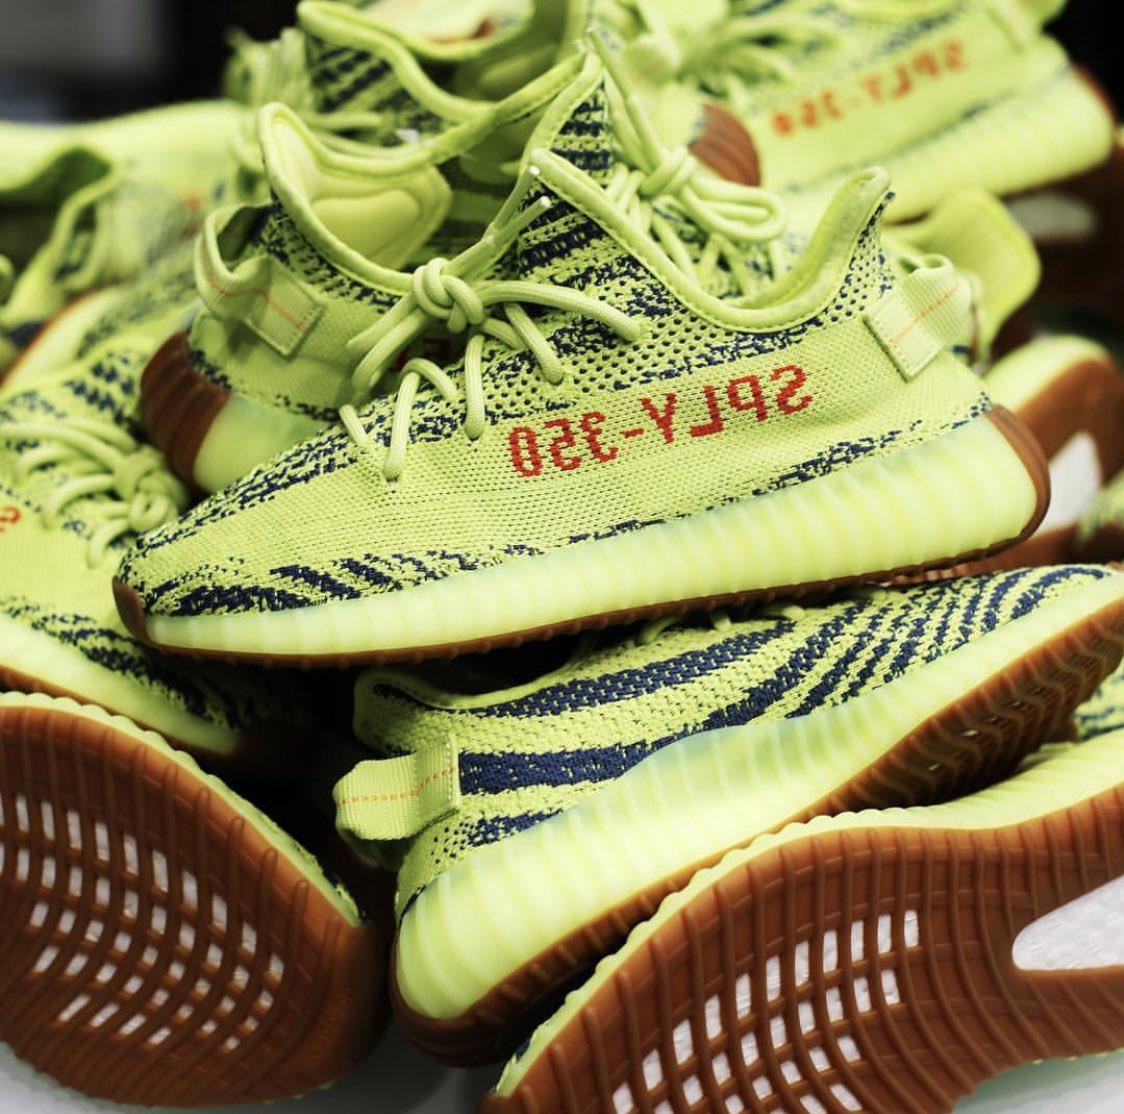 45a00d65483 AD  adidas Originals Yeezy Boost 350 V2  Semi-Frozen Yellow  in 15min via  Footsites Eastbay http   bit.ly 2EtuiYz Footlocker http   bit.ly 2EvG5ps ...